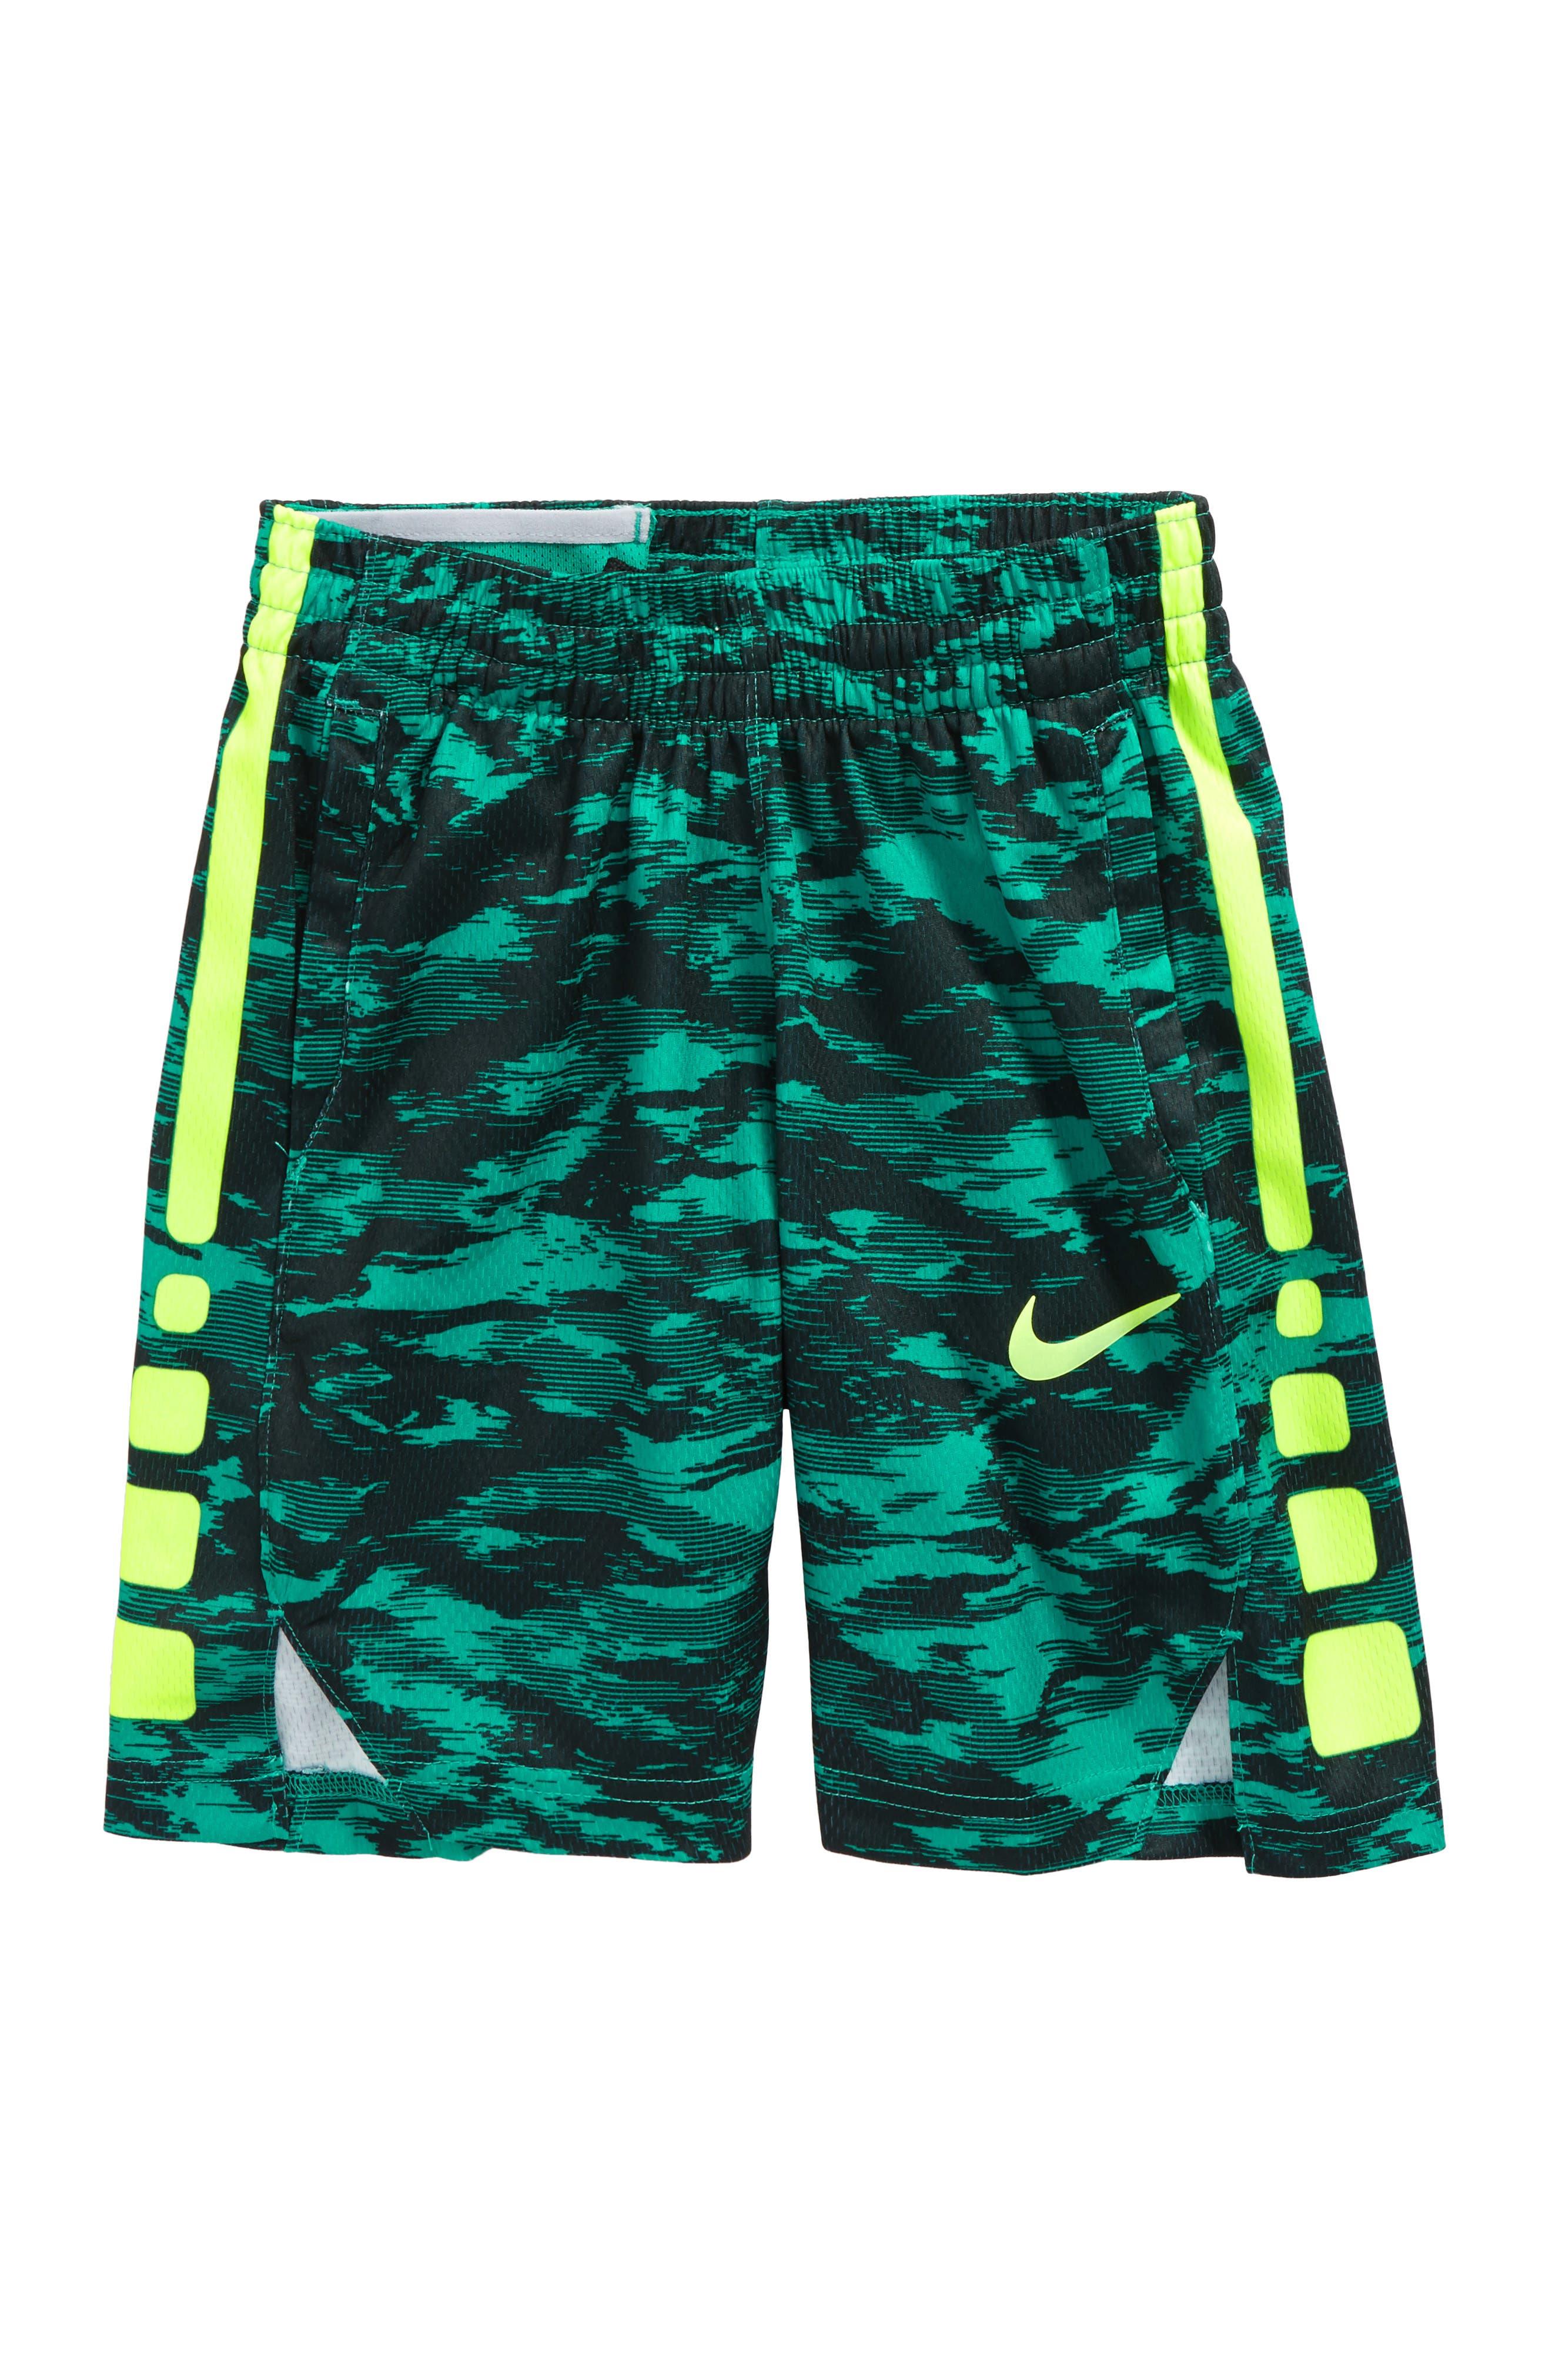 Dry Elite Basketball Shorts,                             Main thumbnail 4, color,